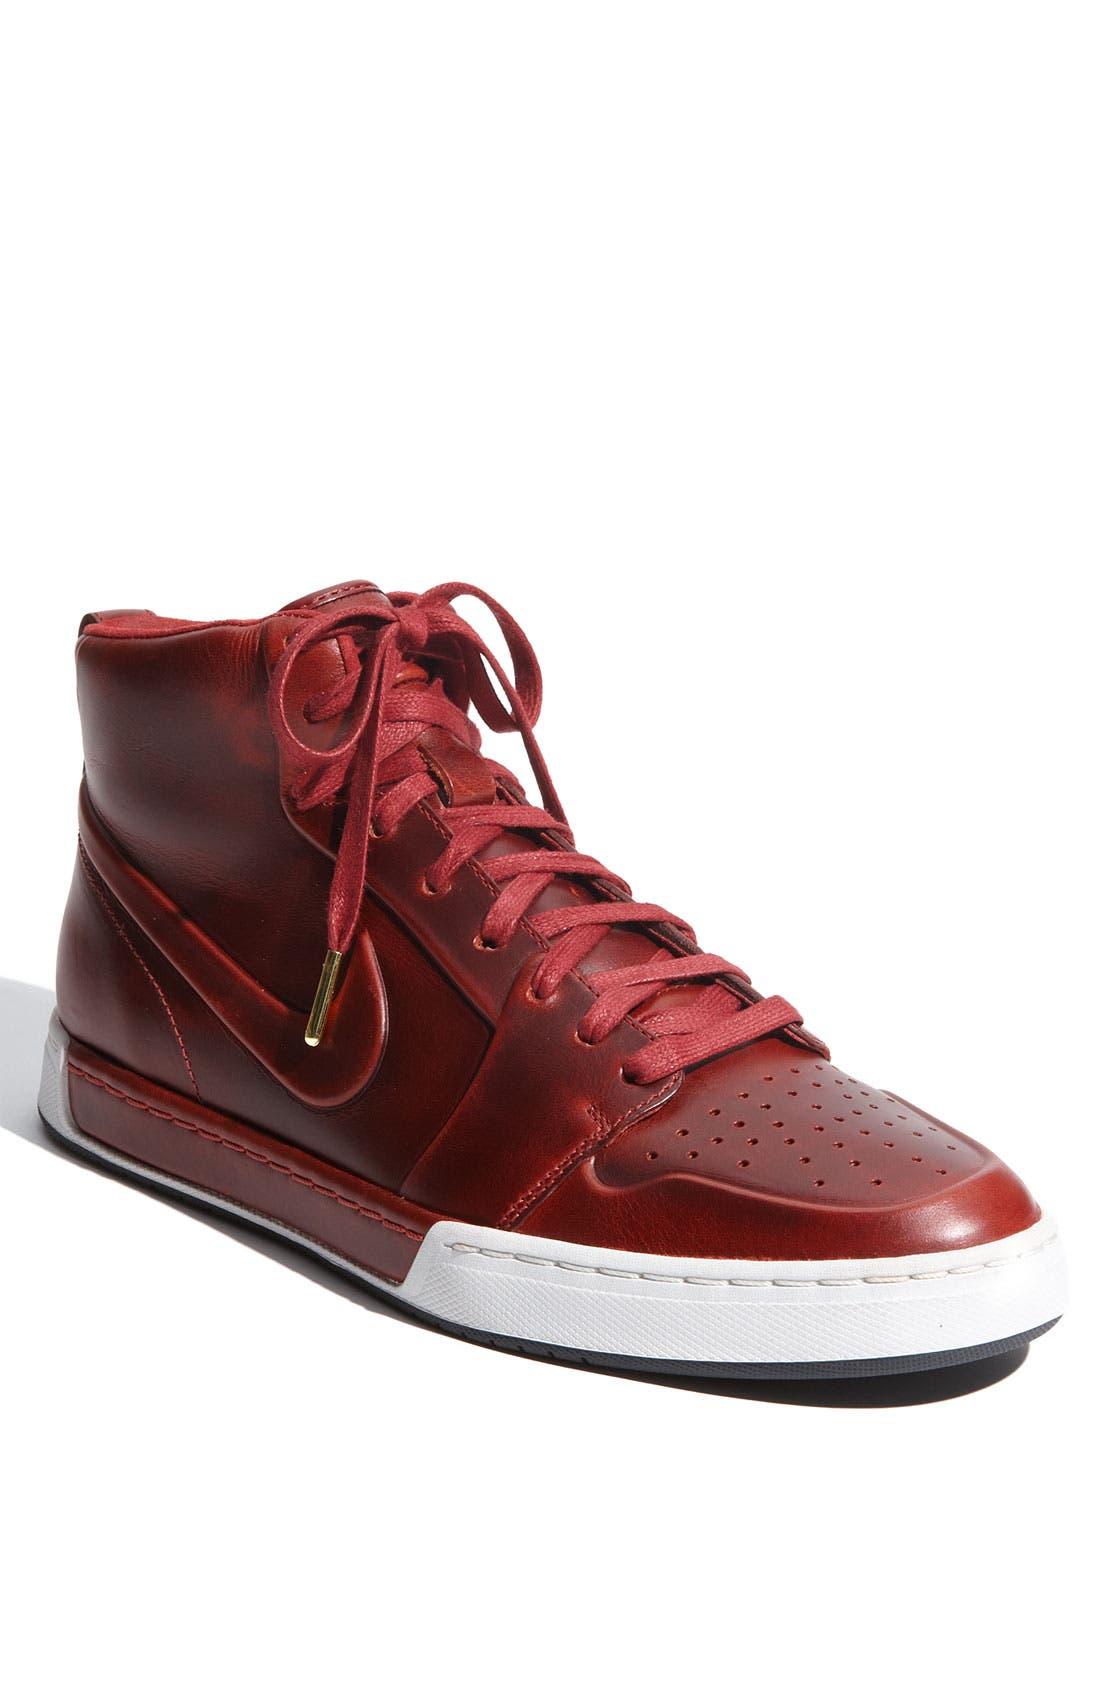 Main Image - Nike 'Air Royal Mid VT' Sneaker